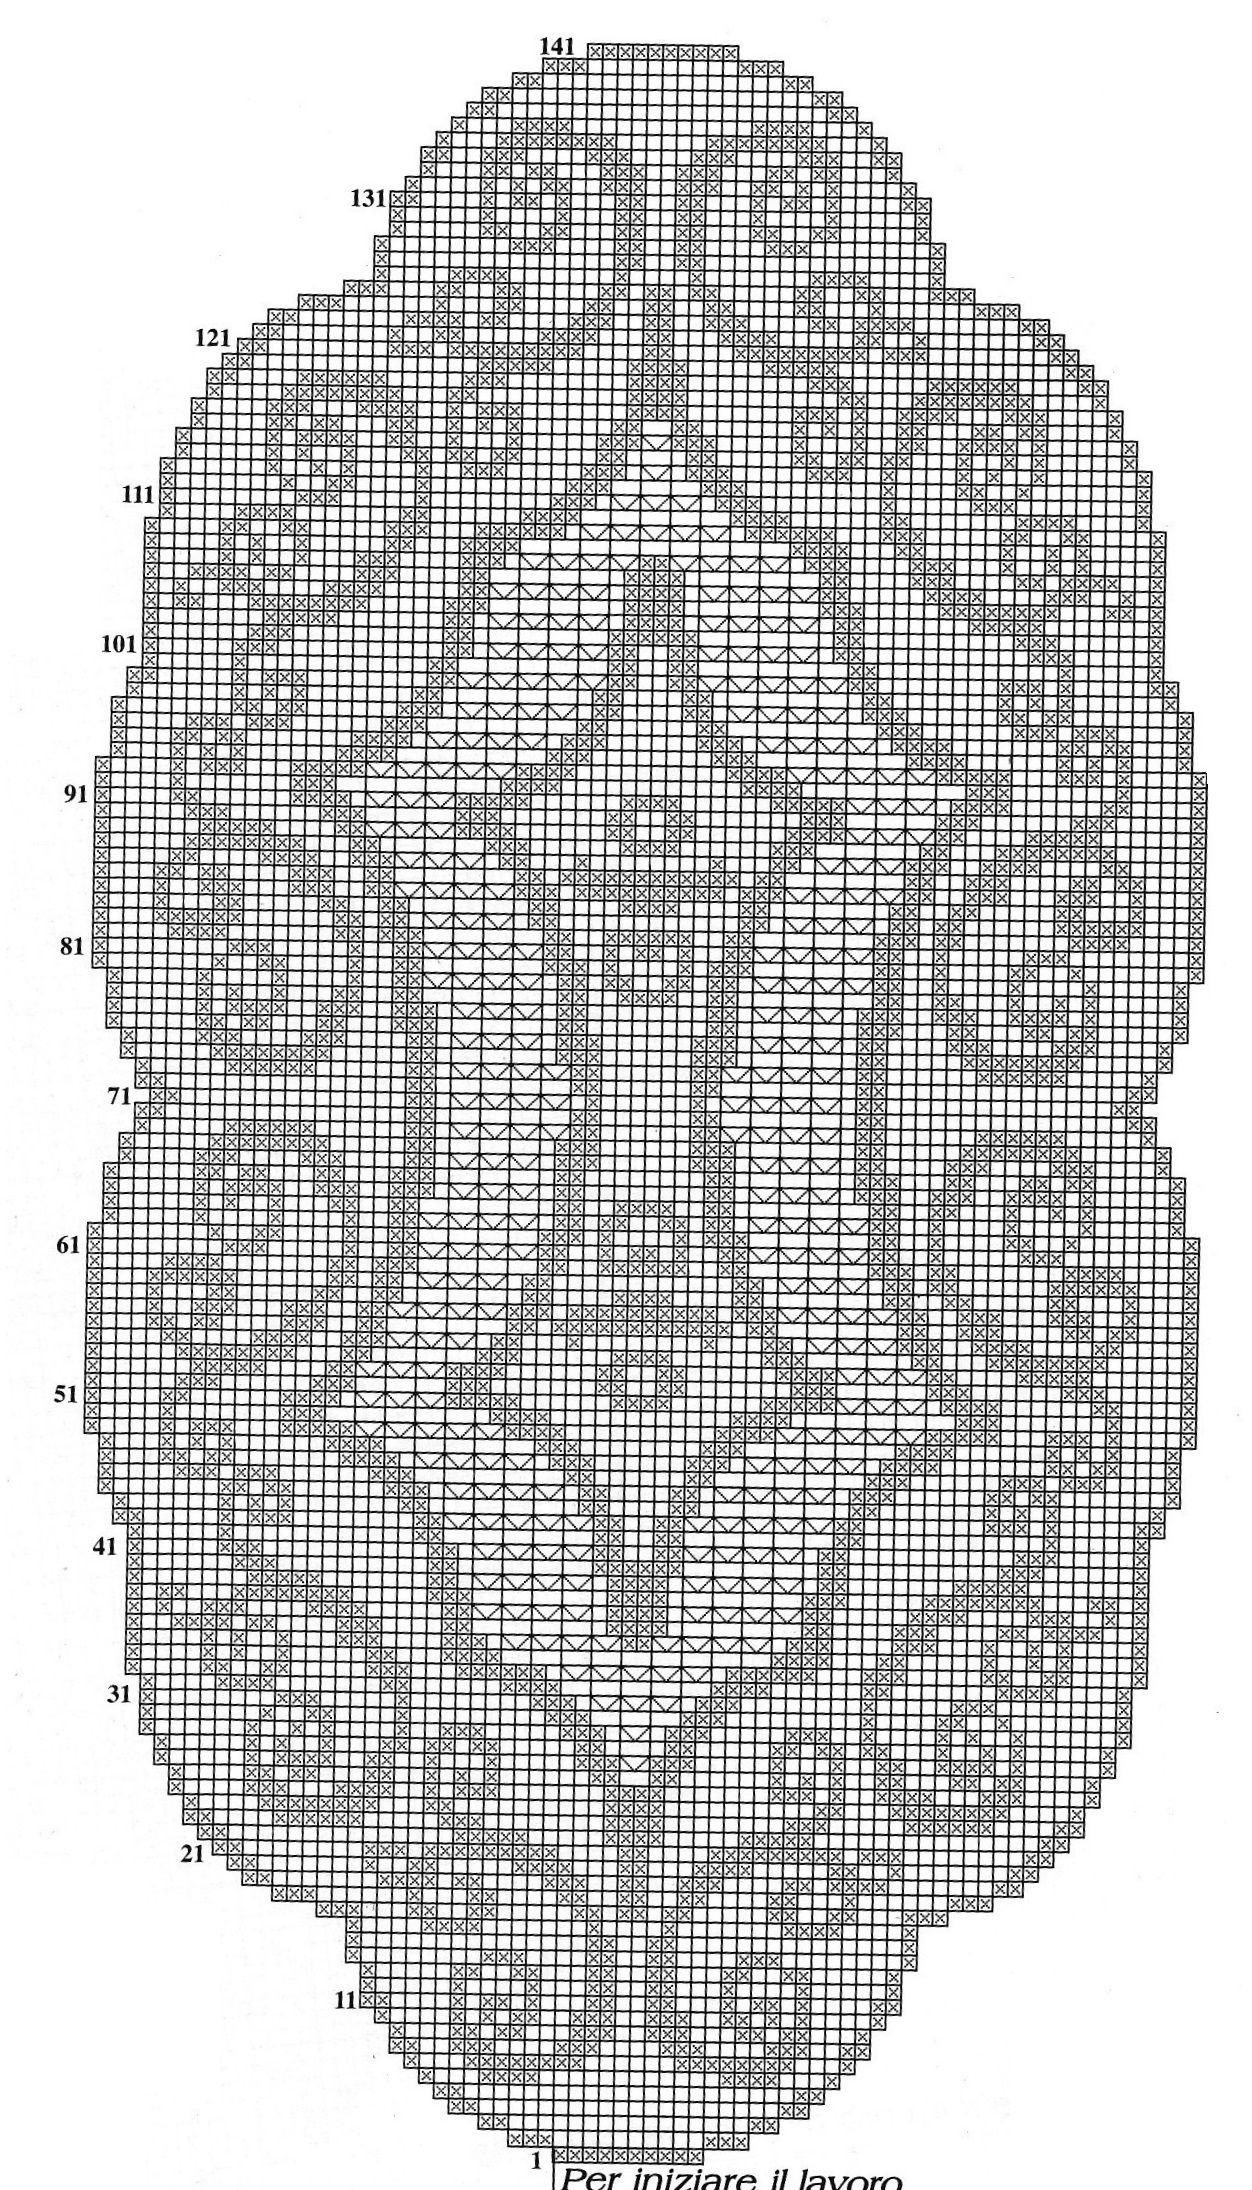 filet crochet patterns | Denenecek projeler | Pinterest | Caminos de ...